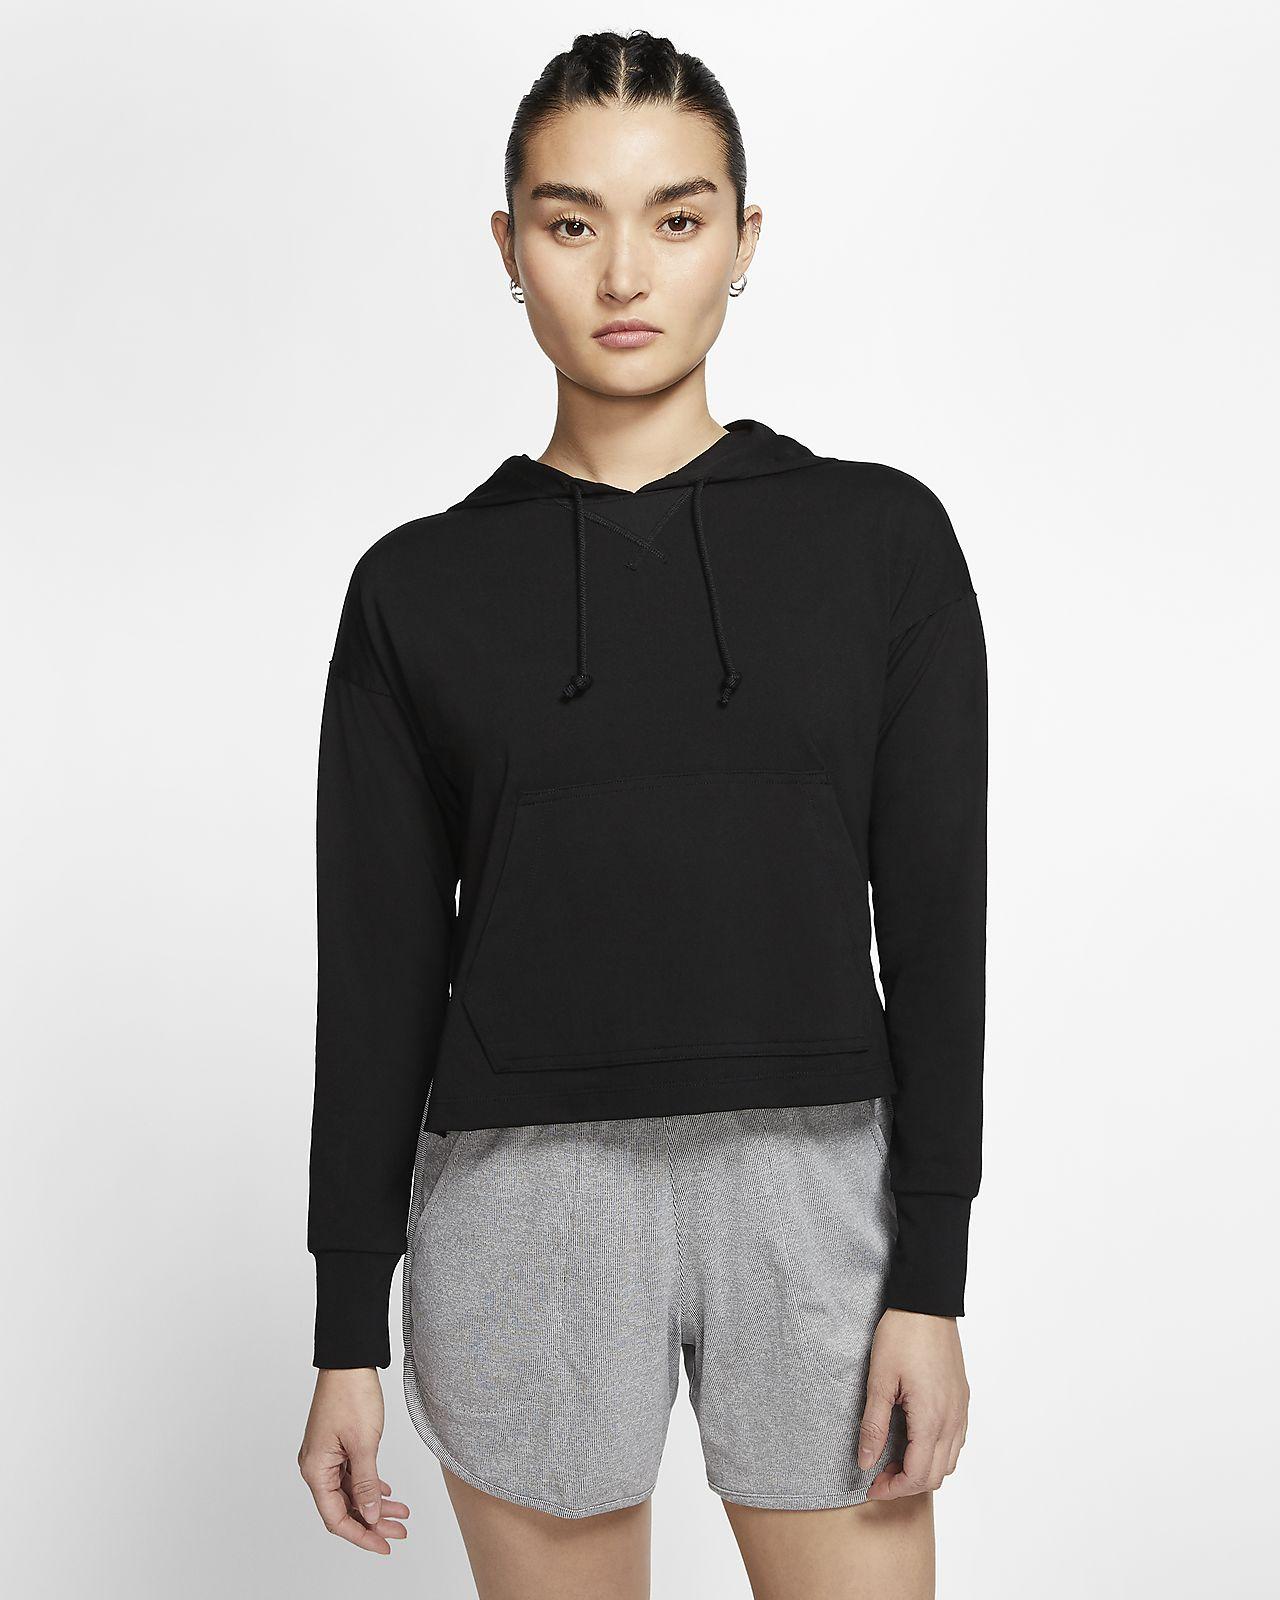 Nike Yoga Women's Cropped Hoodie